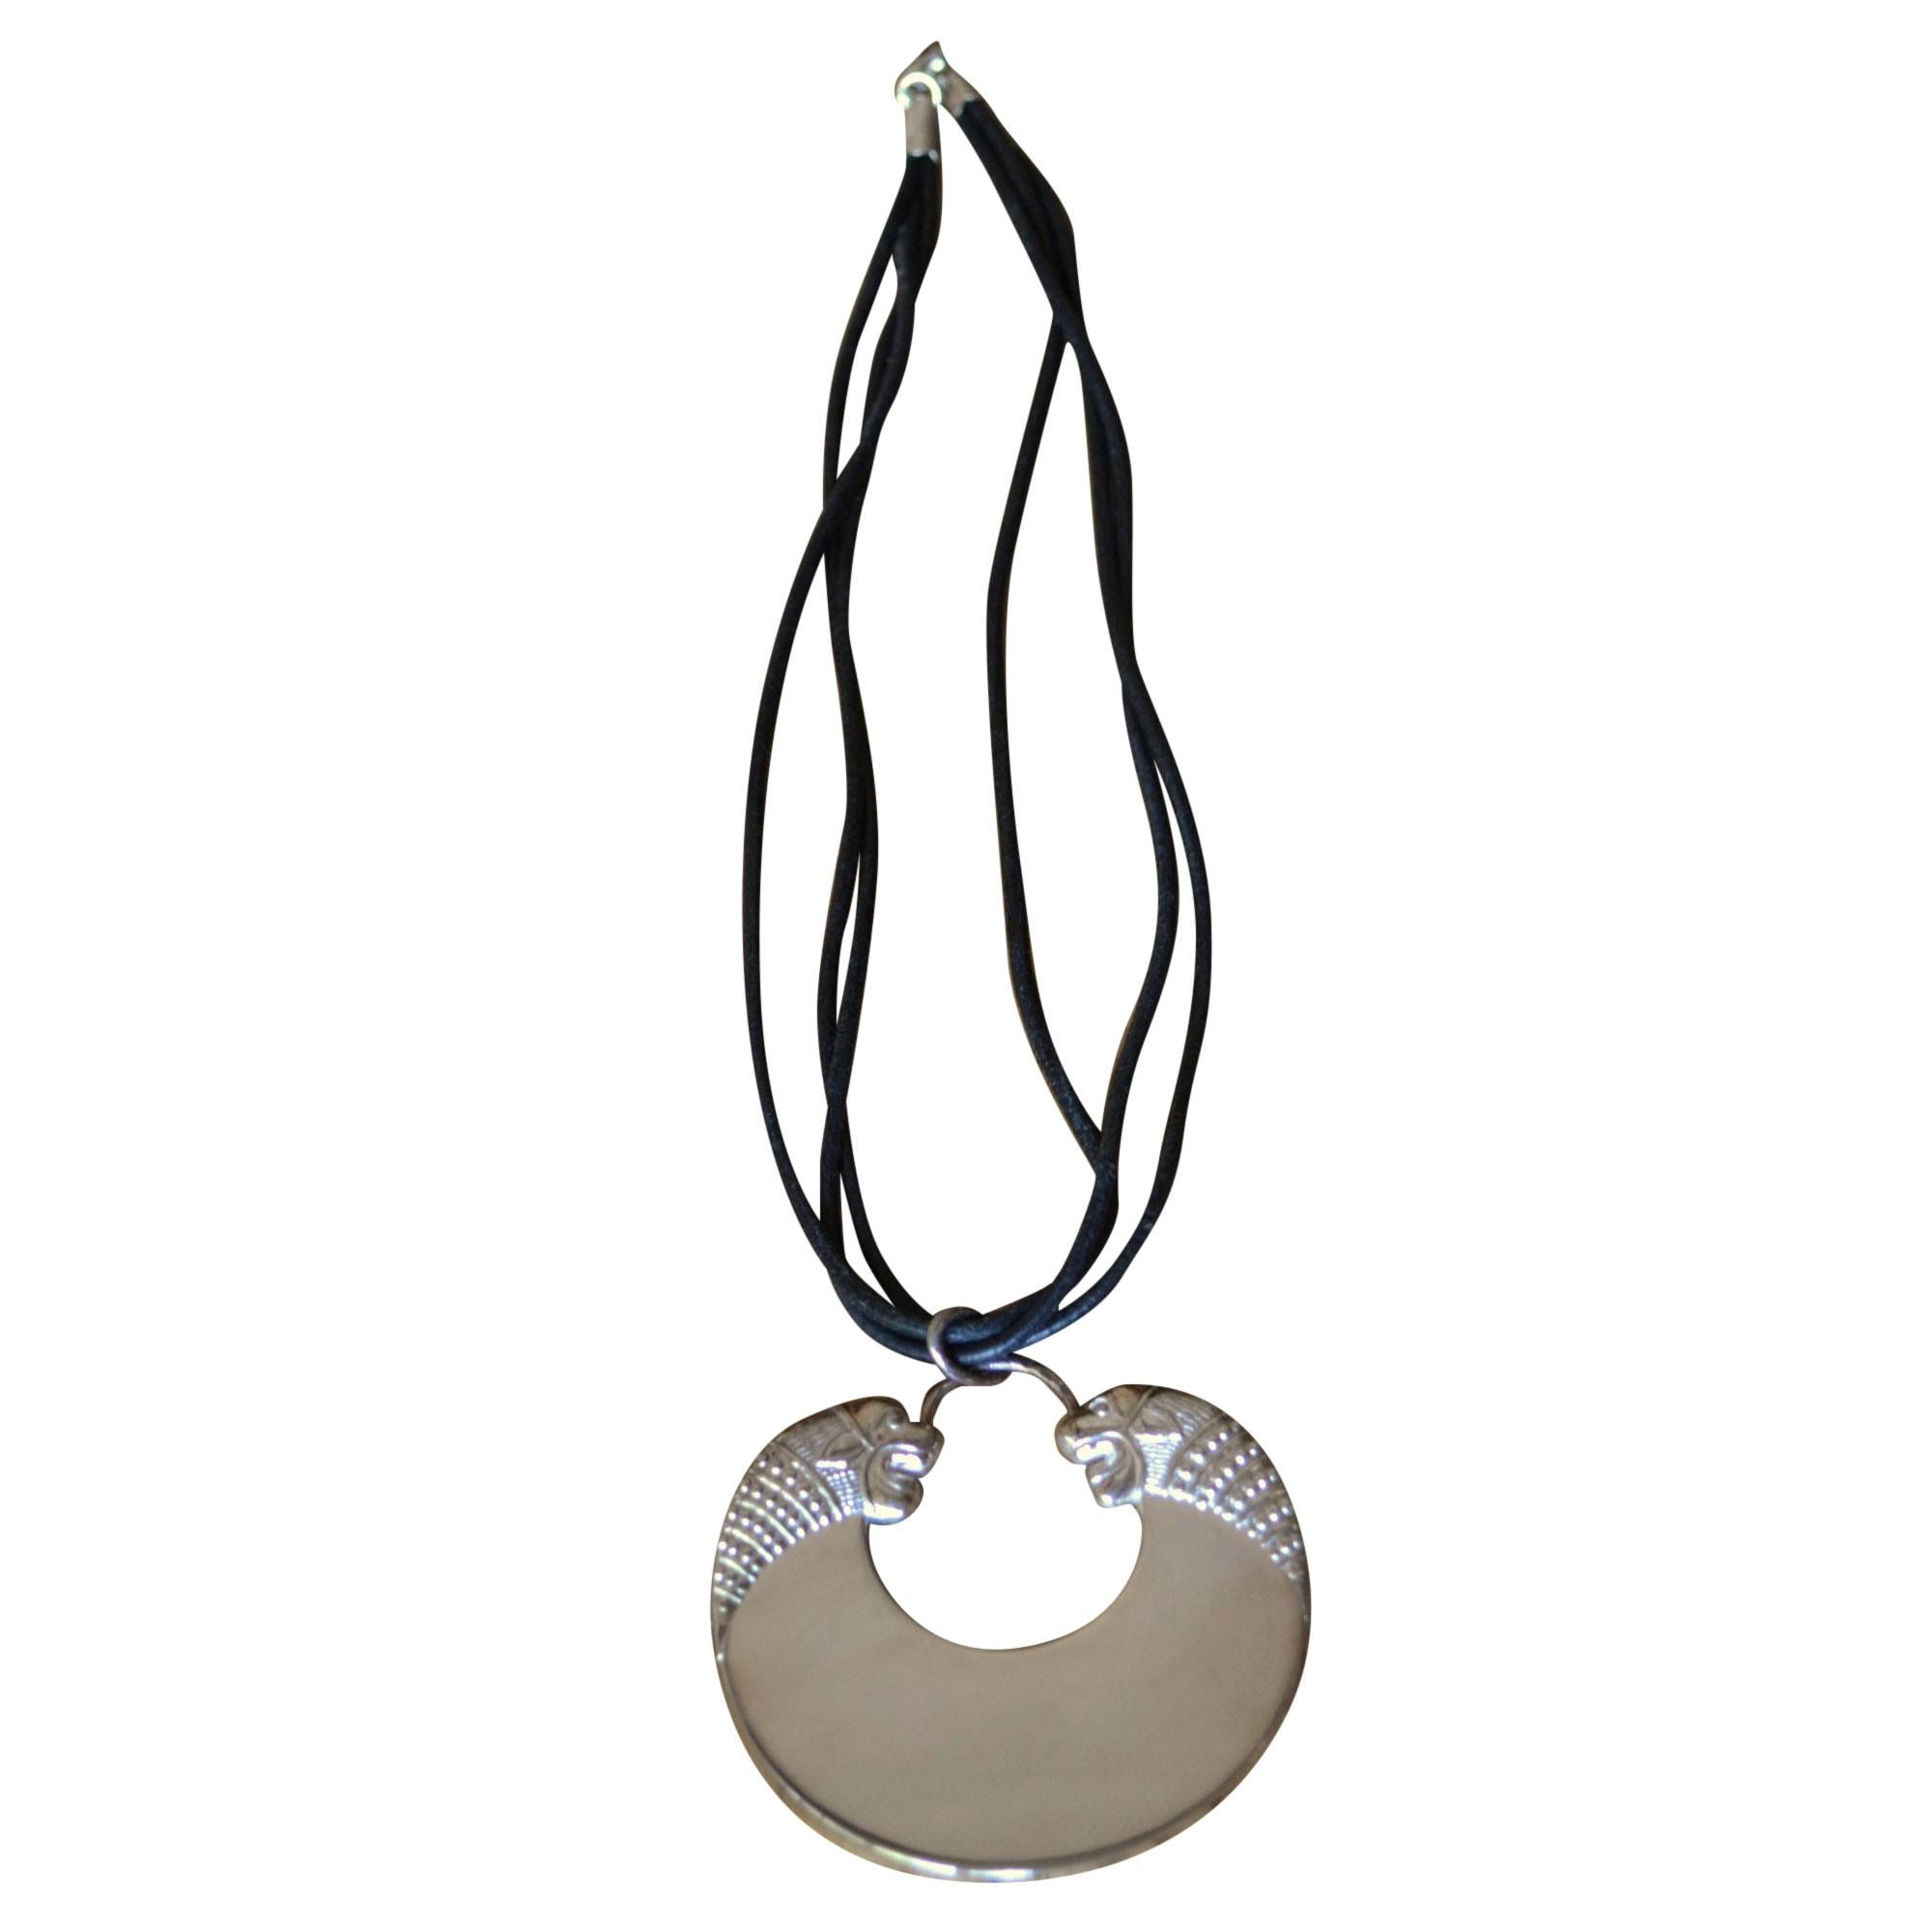 Pendentif, collier pendentif ARTHUS BERTRAND Argenté, acier